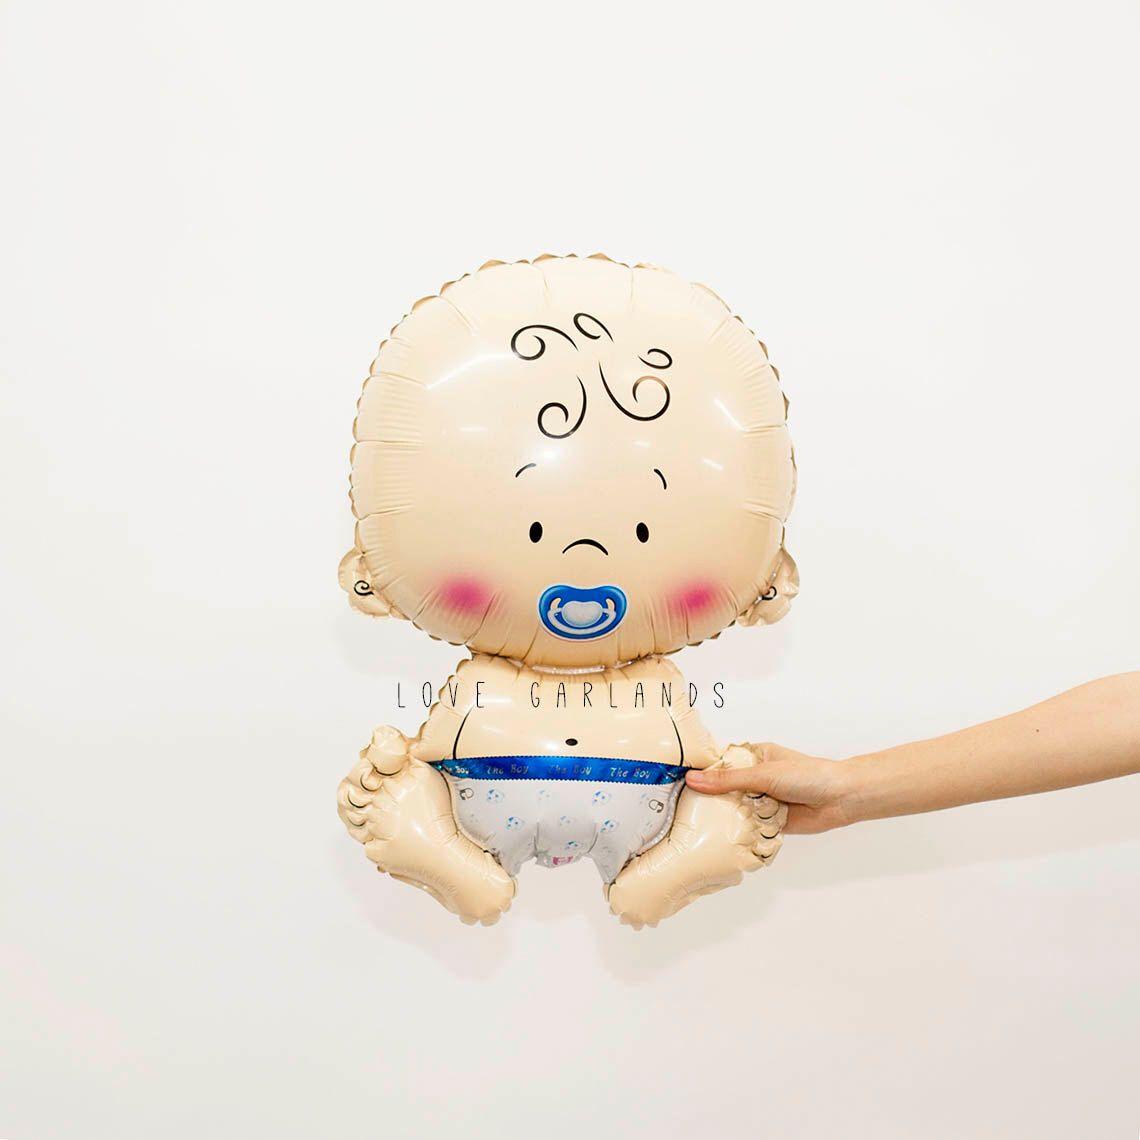 Baby Boy Balloon, Baby Boy Shower Balloon, Baby Balloon, Blue Baby Shower Balloons, Baby Boy Shower Decor, Gender Reveal Balloons by LoveGarlands on Etsy https://www.etsy.com/listing/469498089/baby-boy-balloon-baby-boy-shower-balloon